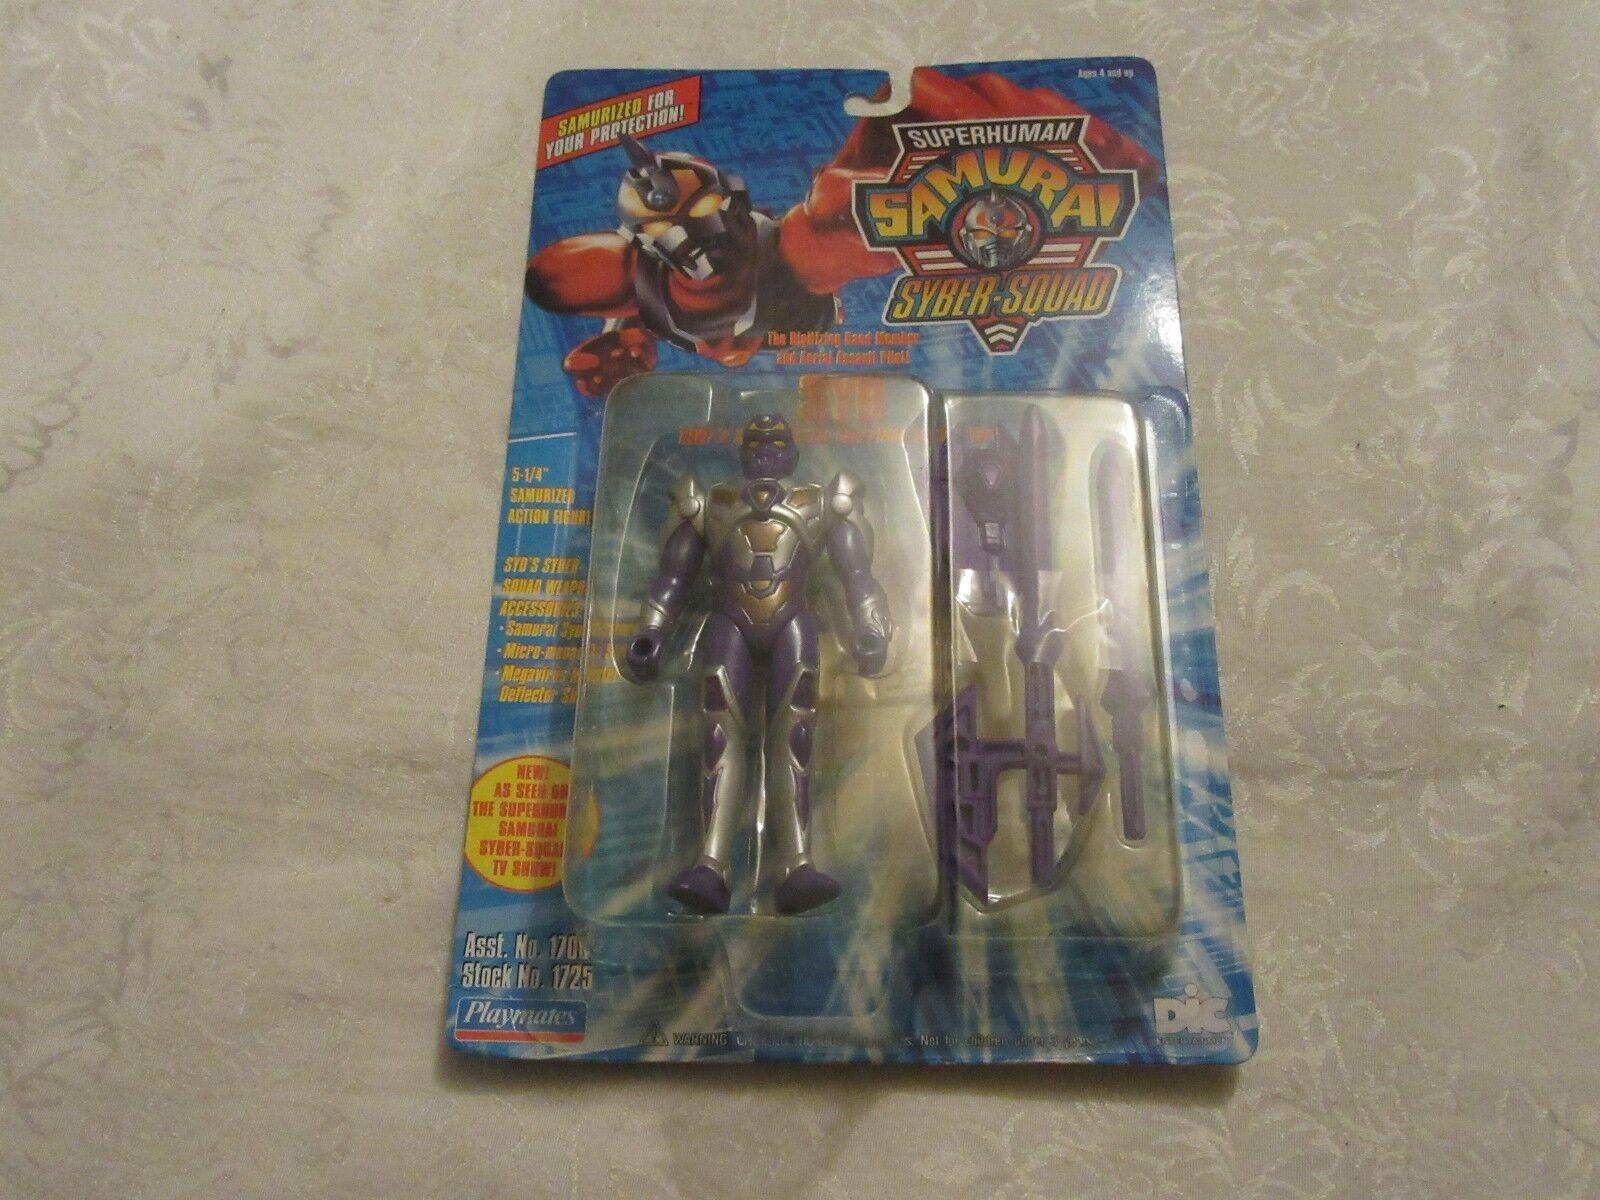 Playmates 1994 Superhuman Samurai Syber-Squad 5 1/4  Syd Action Figure